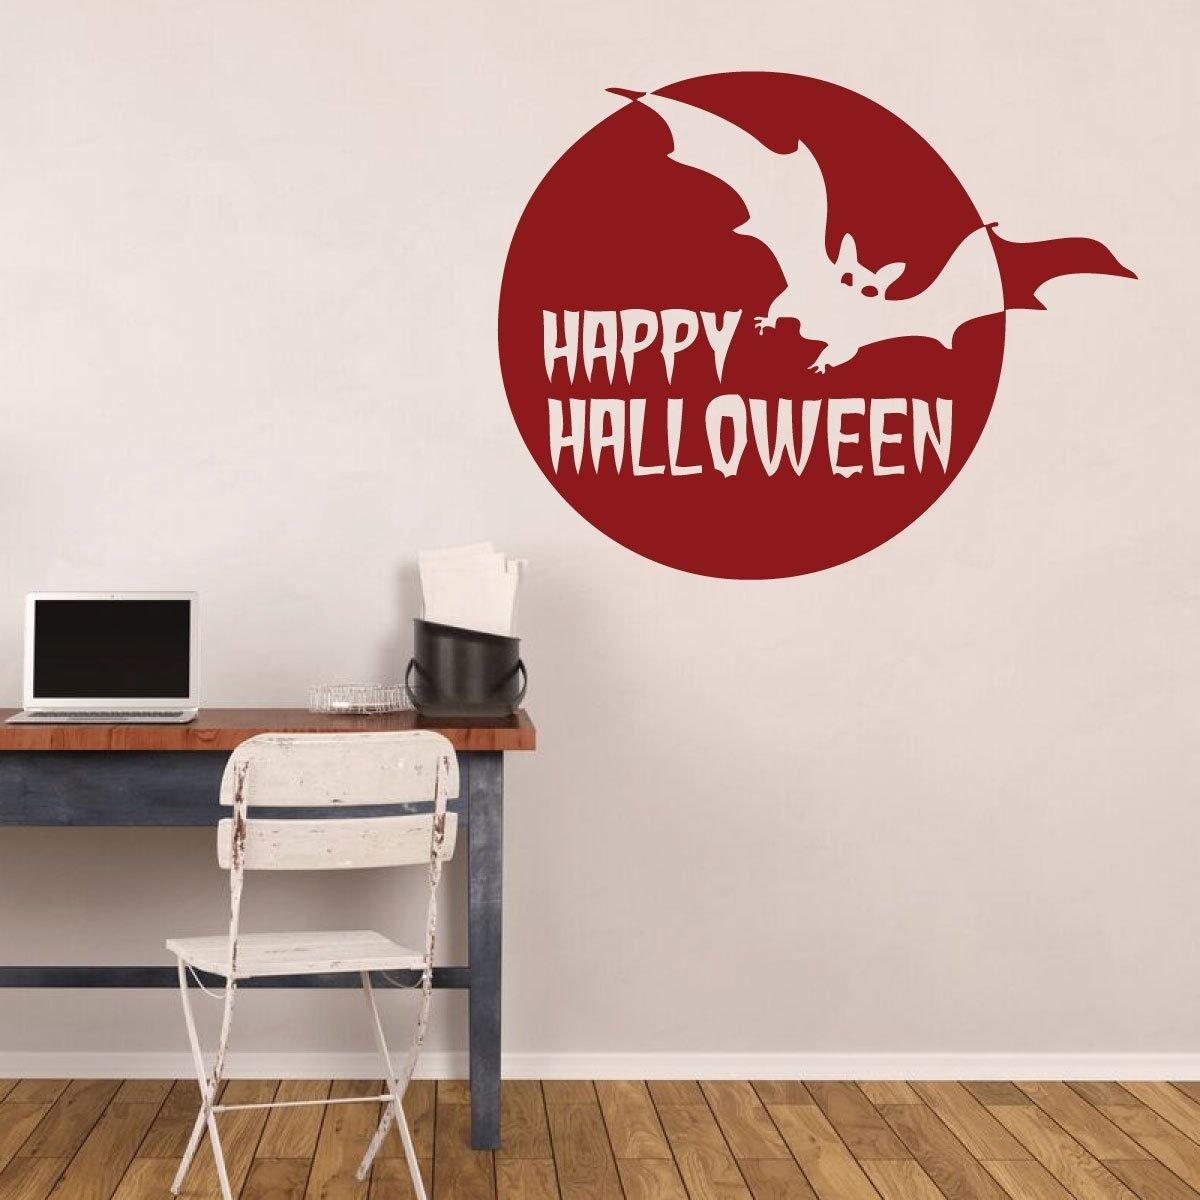 Full Moon Halloween Party Vinyl Wall Decor Halloween Bats Halloween Decals Happy Halloween Halloween Decal All Hallows Eve